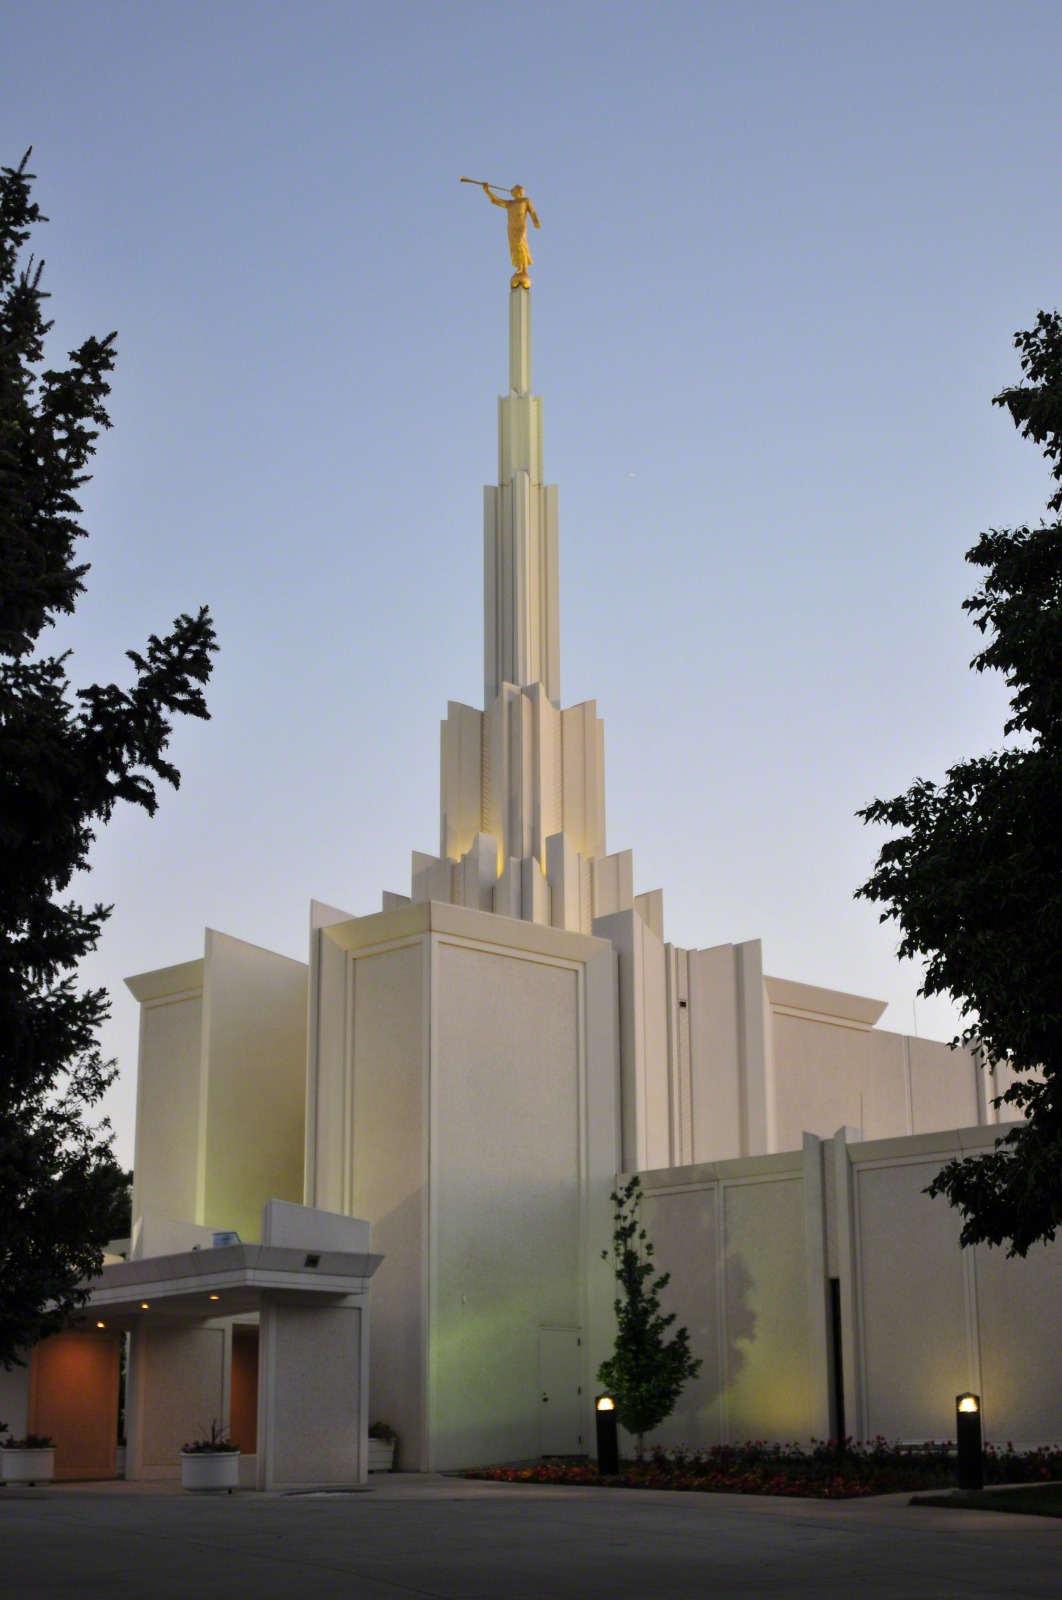 Denver dolorado mormon singles The Denver Scene - NORMONS